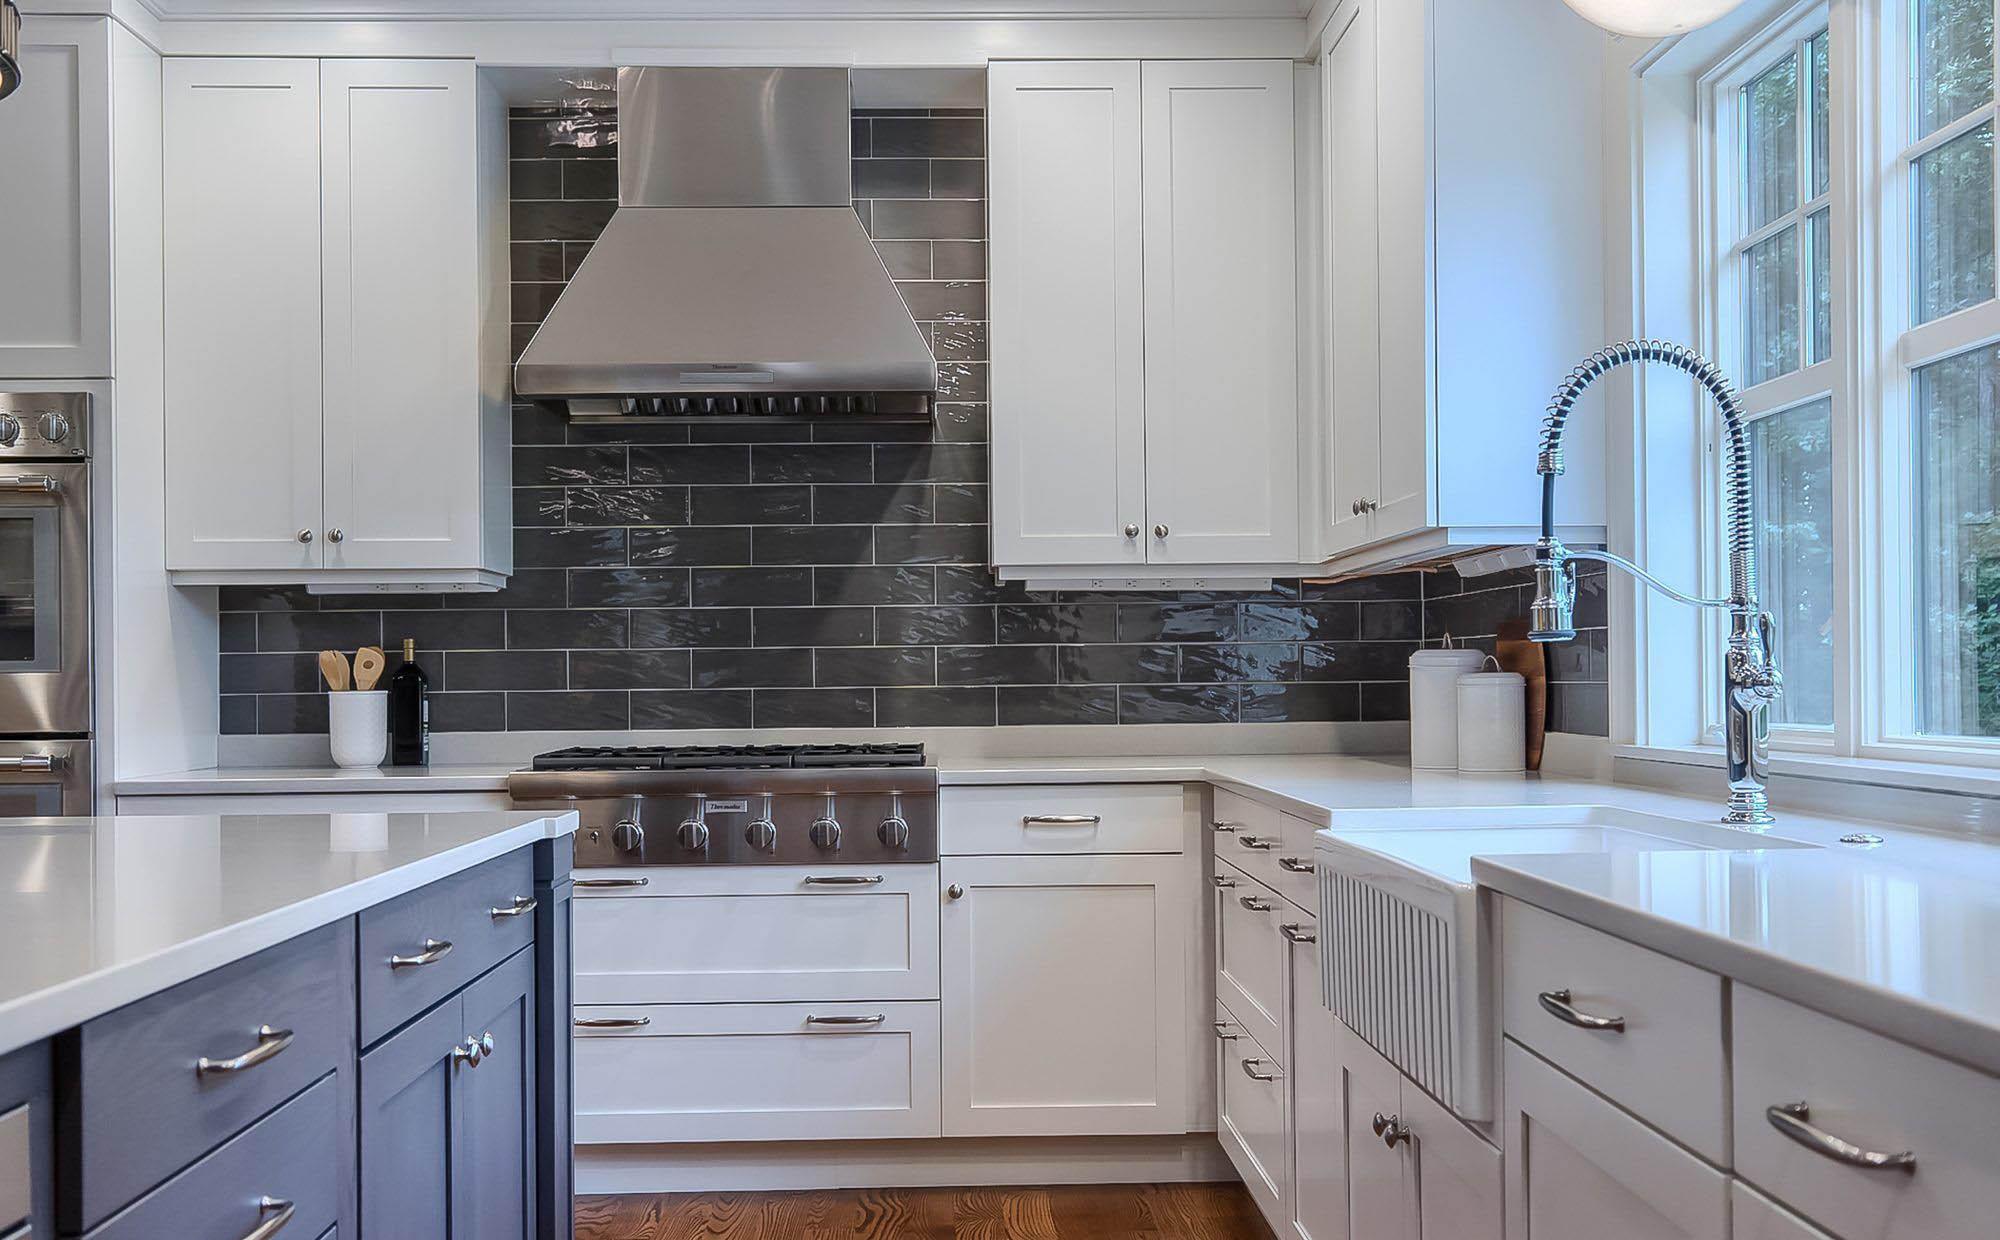 beautiful luxury kitchen design with a white enamel farmhouse sink under large windows.